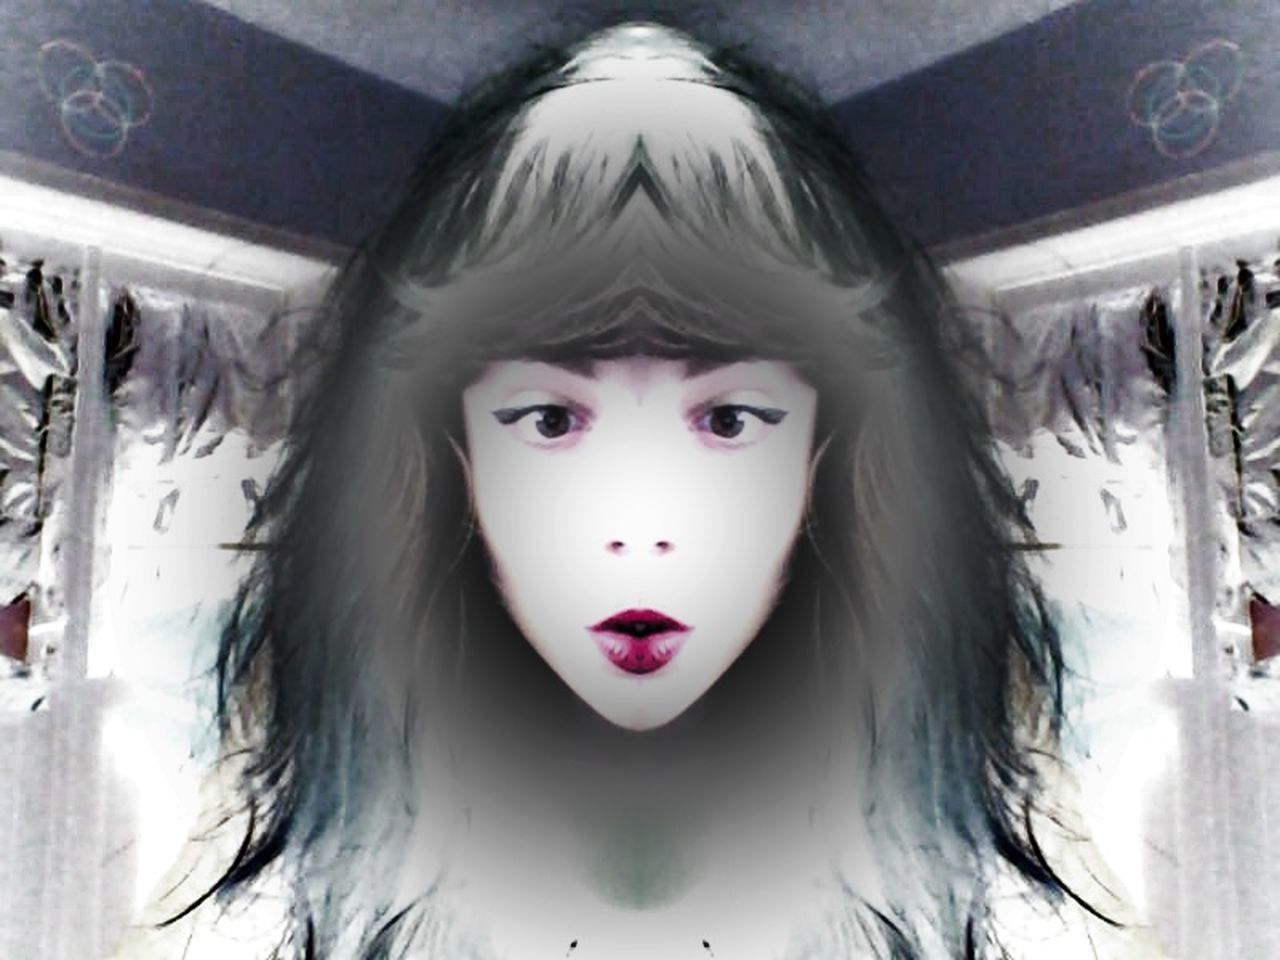 Alien Girl Balloon Head Human Face Long Hair No Body Portrait Symbols Water Me